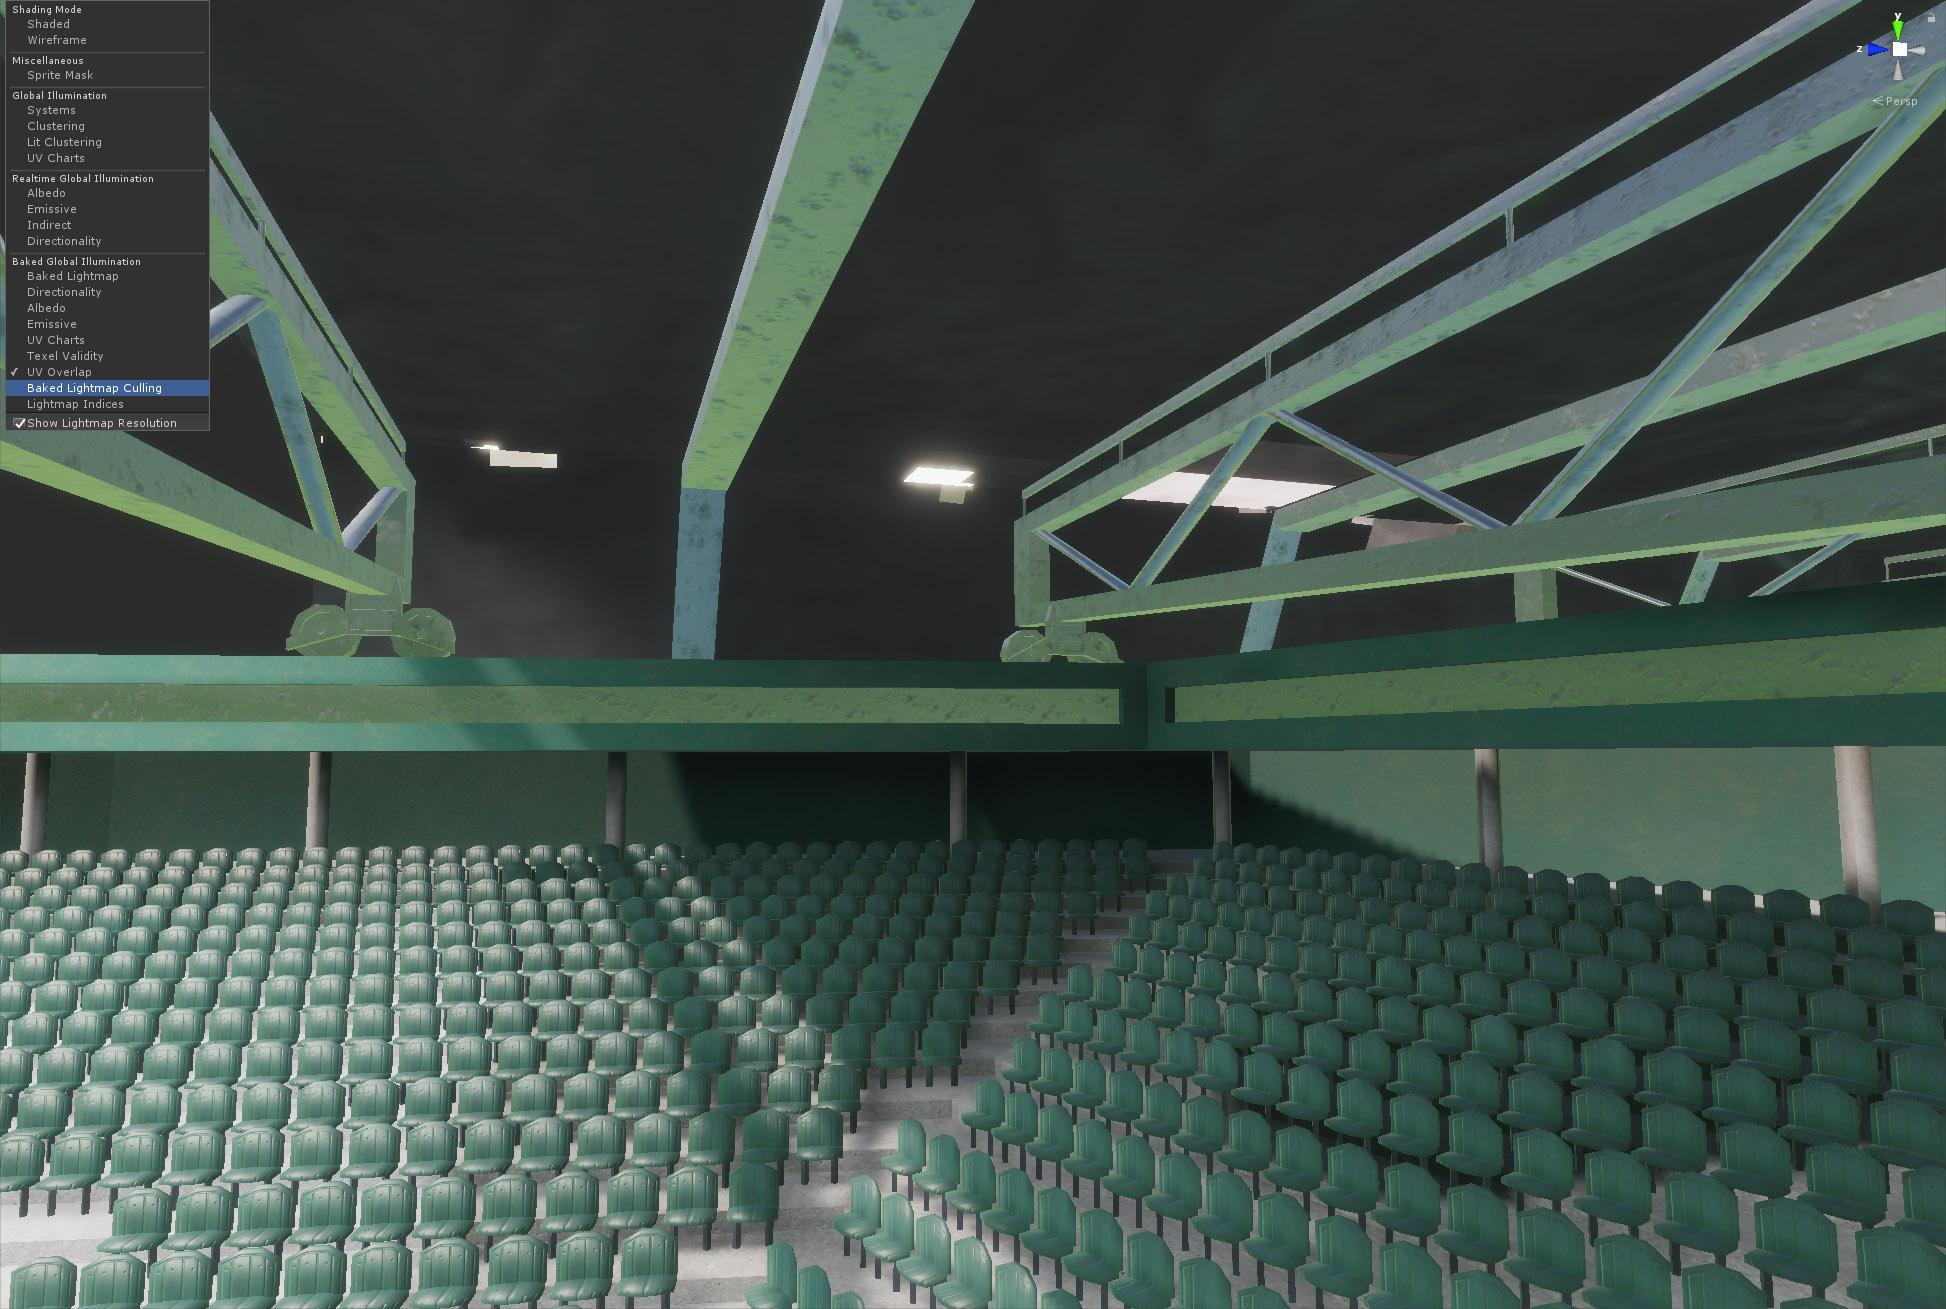 2019-08 - TE4 Stadium - Progressive GPU - UV Overlap #2.jpg